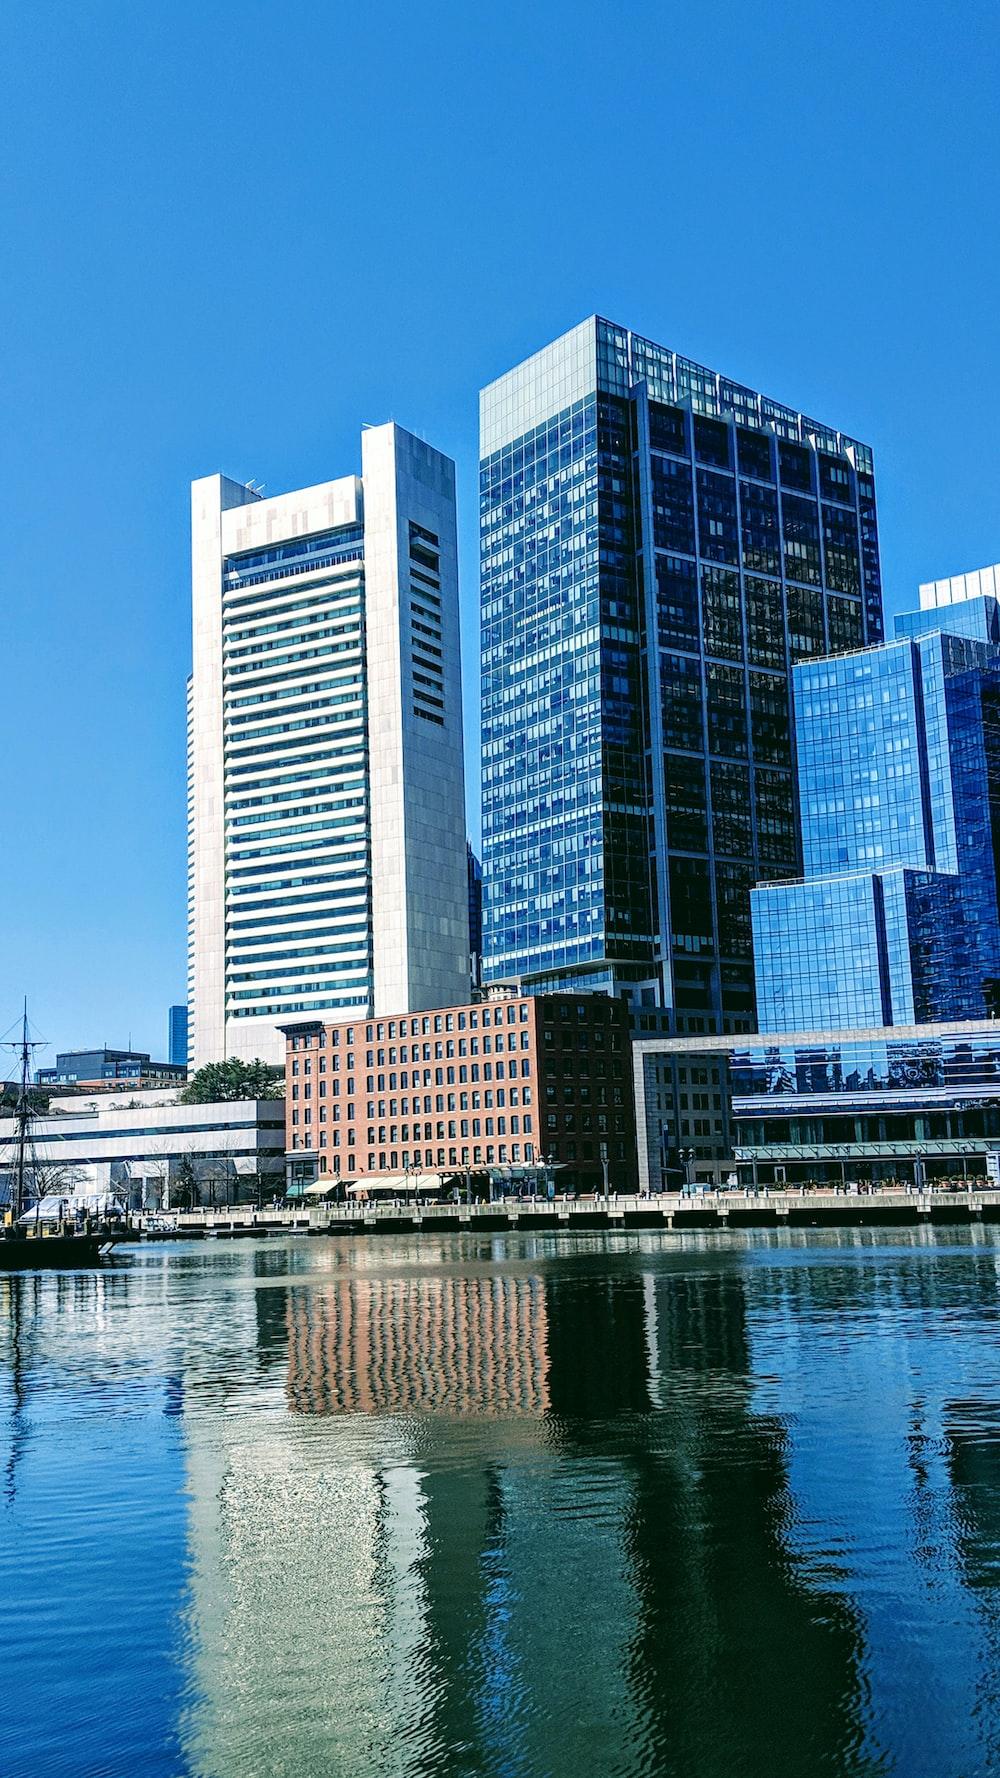 buildings across body of water